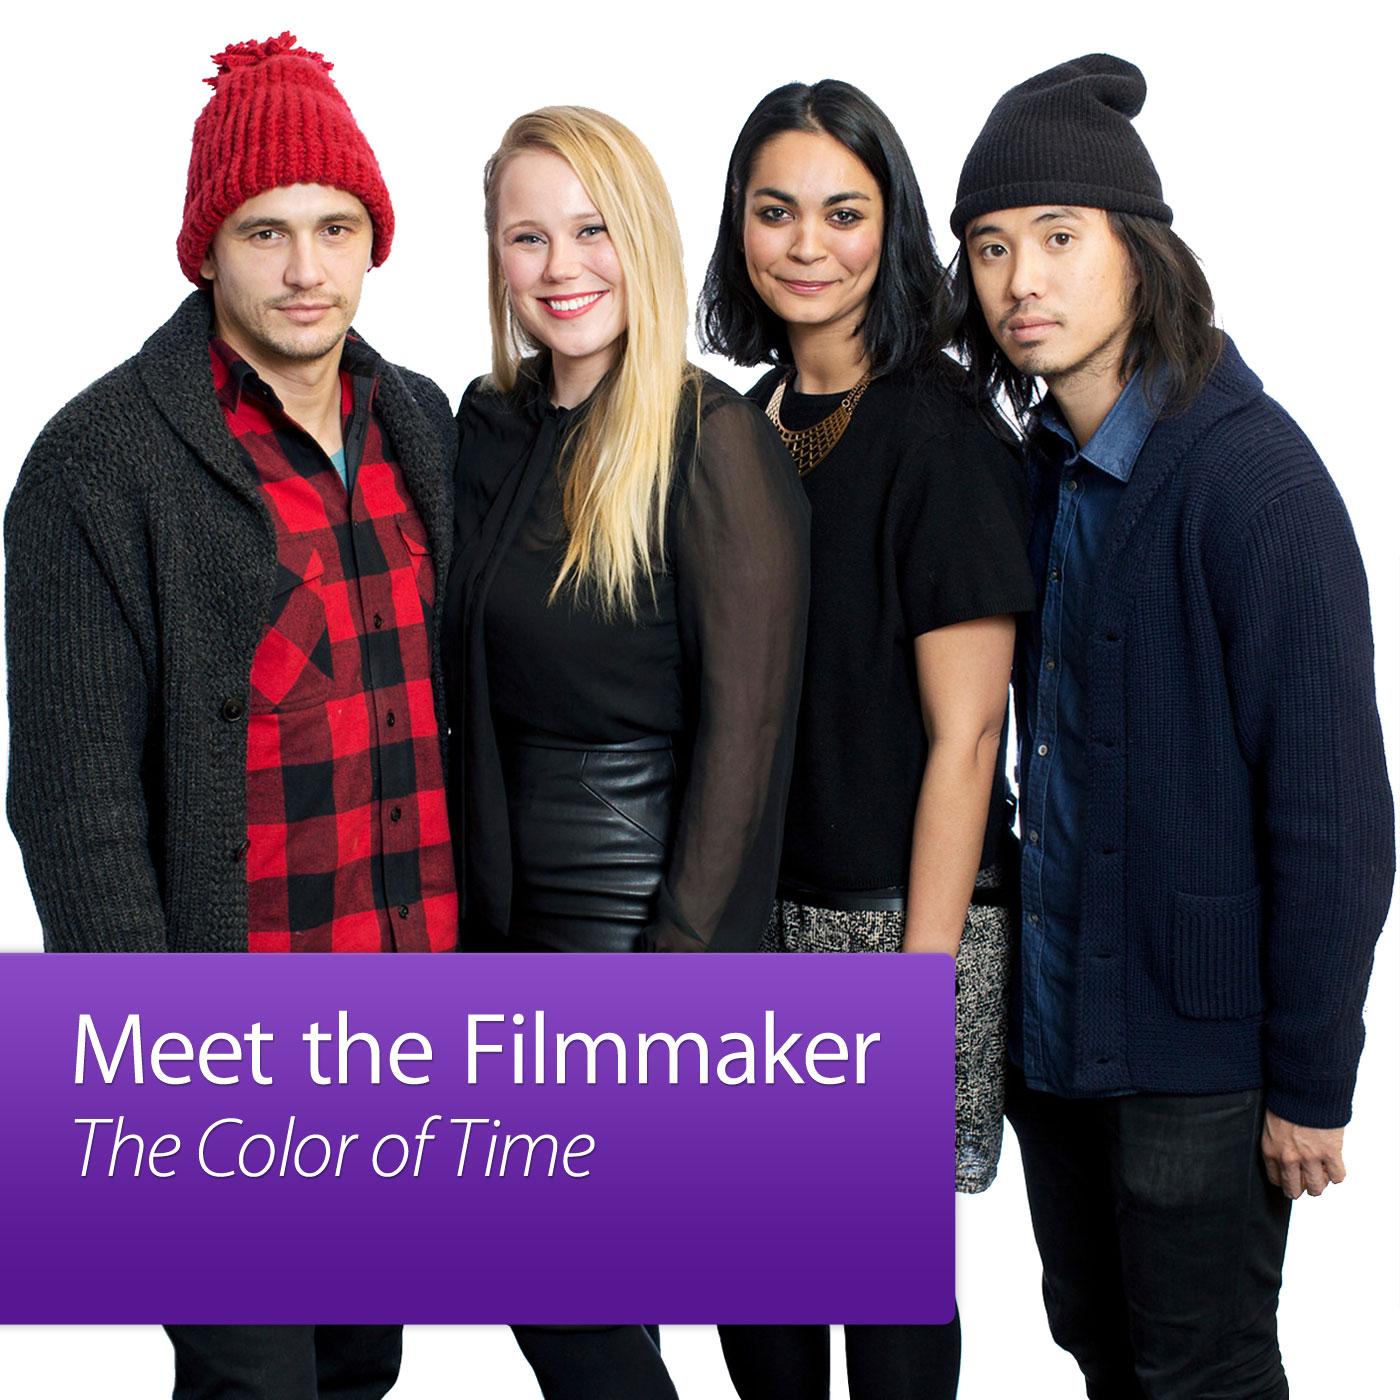 James Franco, Shruti Ganguly, Bruce Thierry Cheung, and Pamela Romanowsky: Meet the Filmmaker